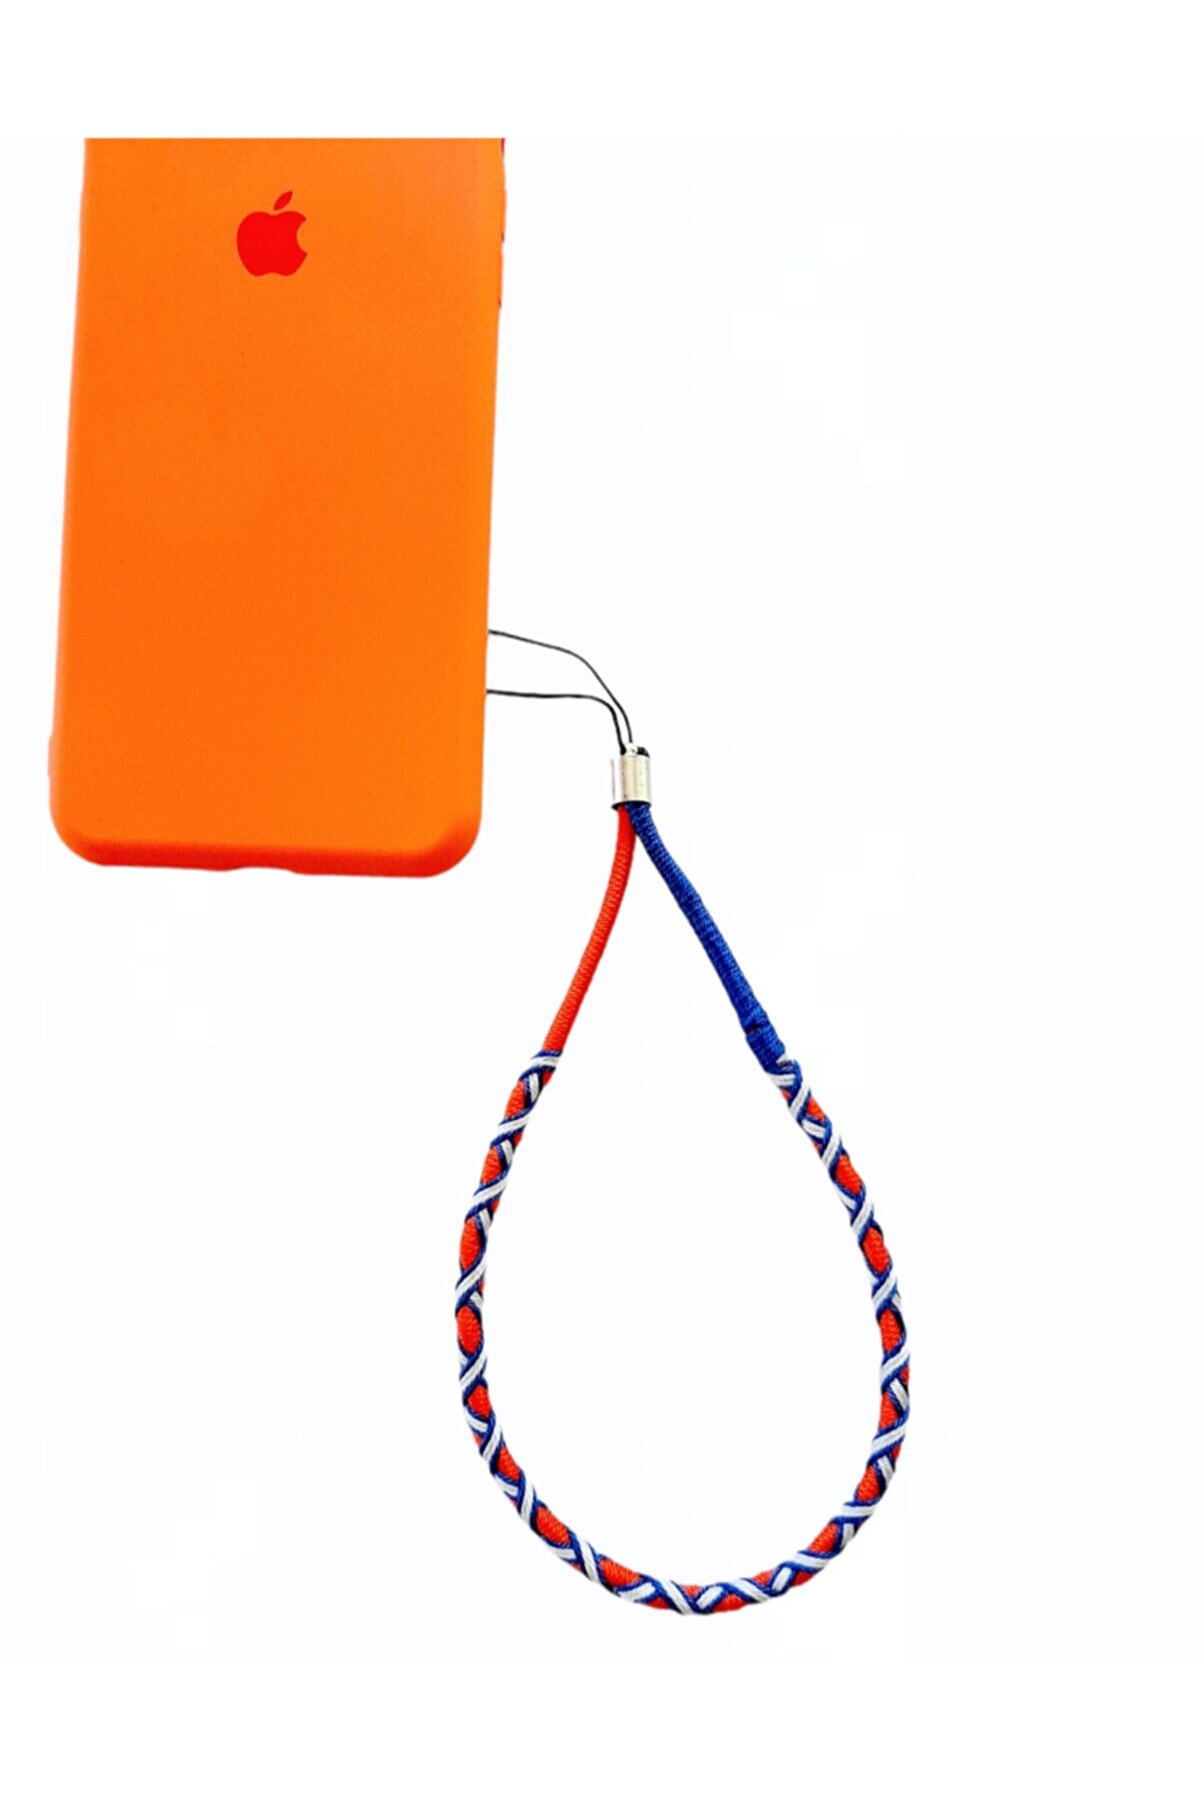 rangmobil Örgü Telefon Ipi Bileklik Telefon Örgü Ip